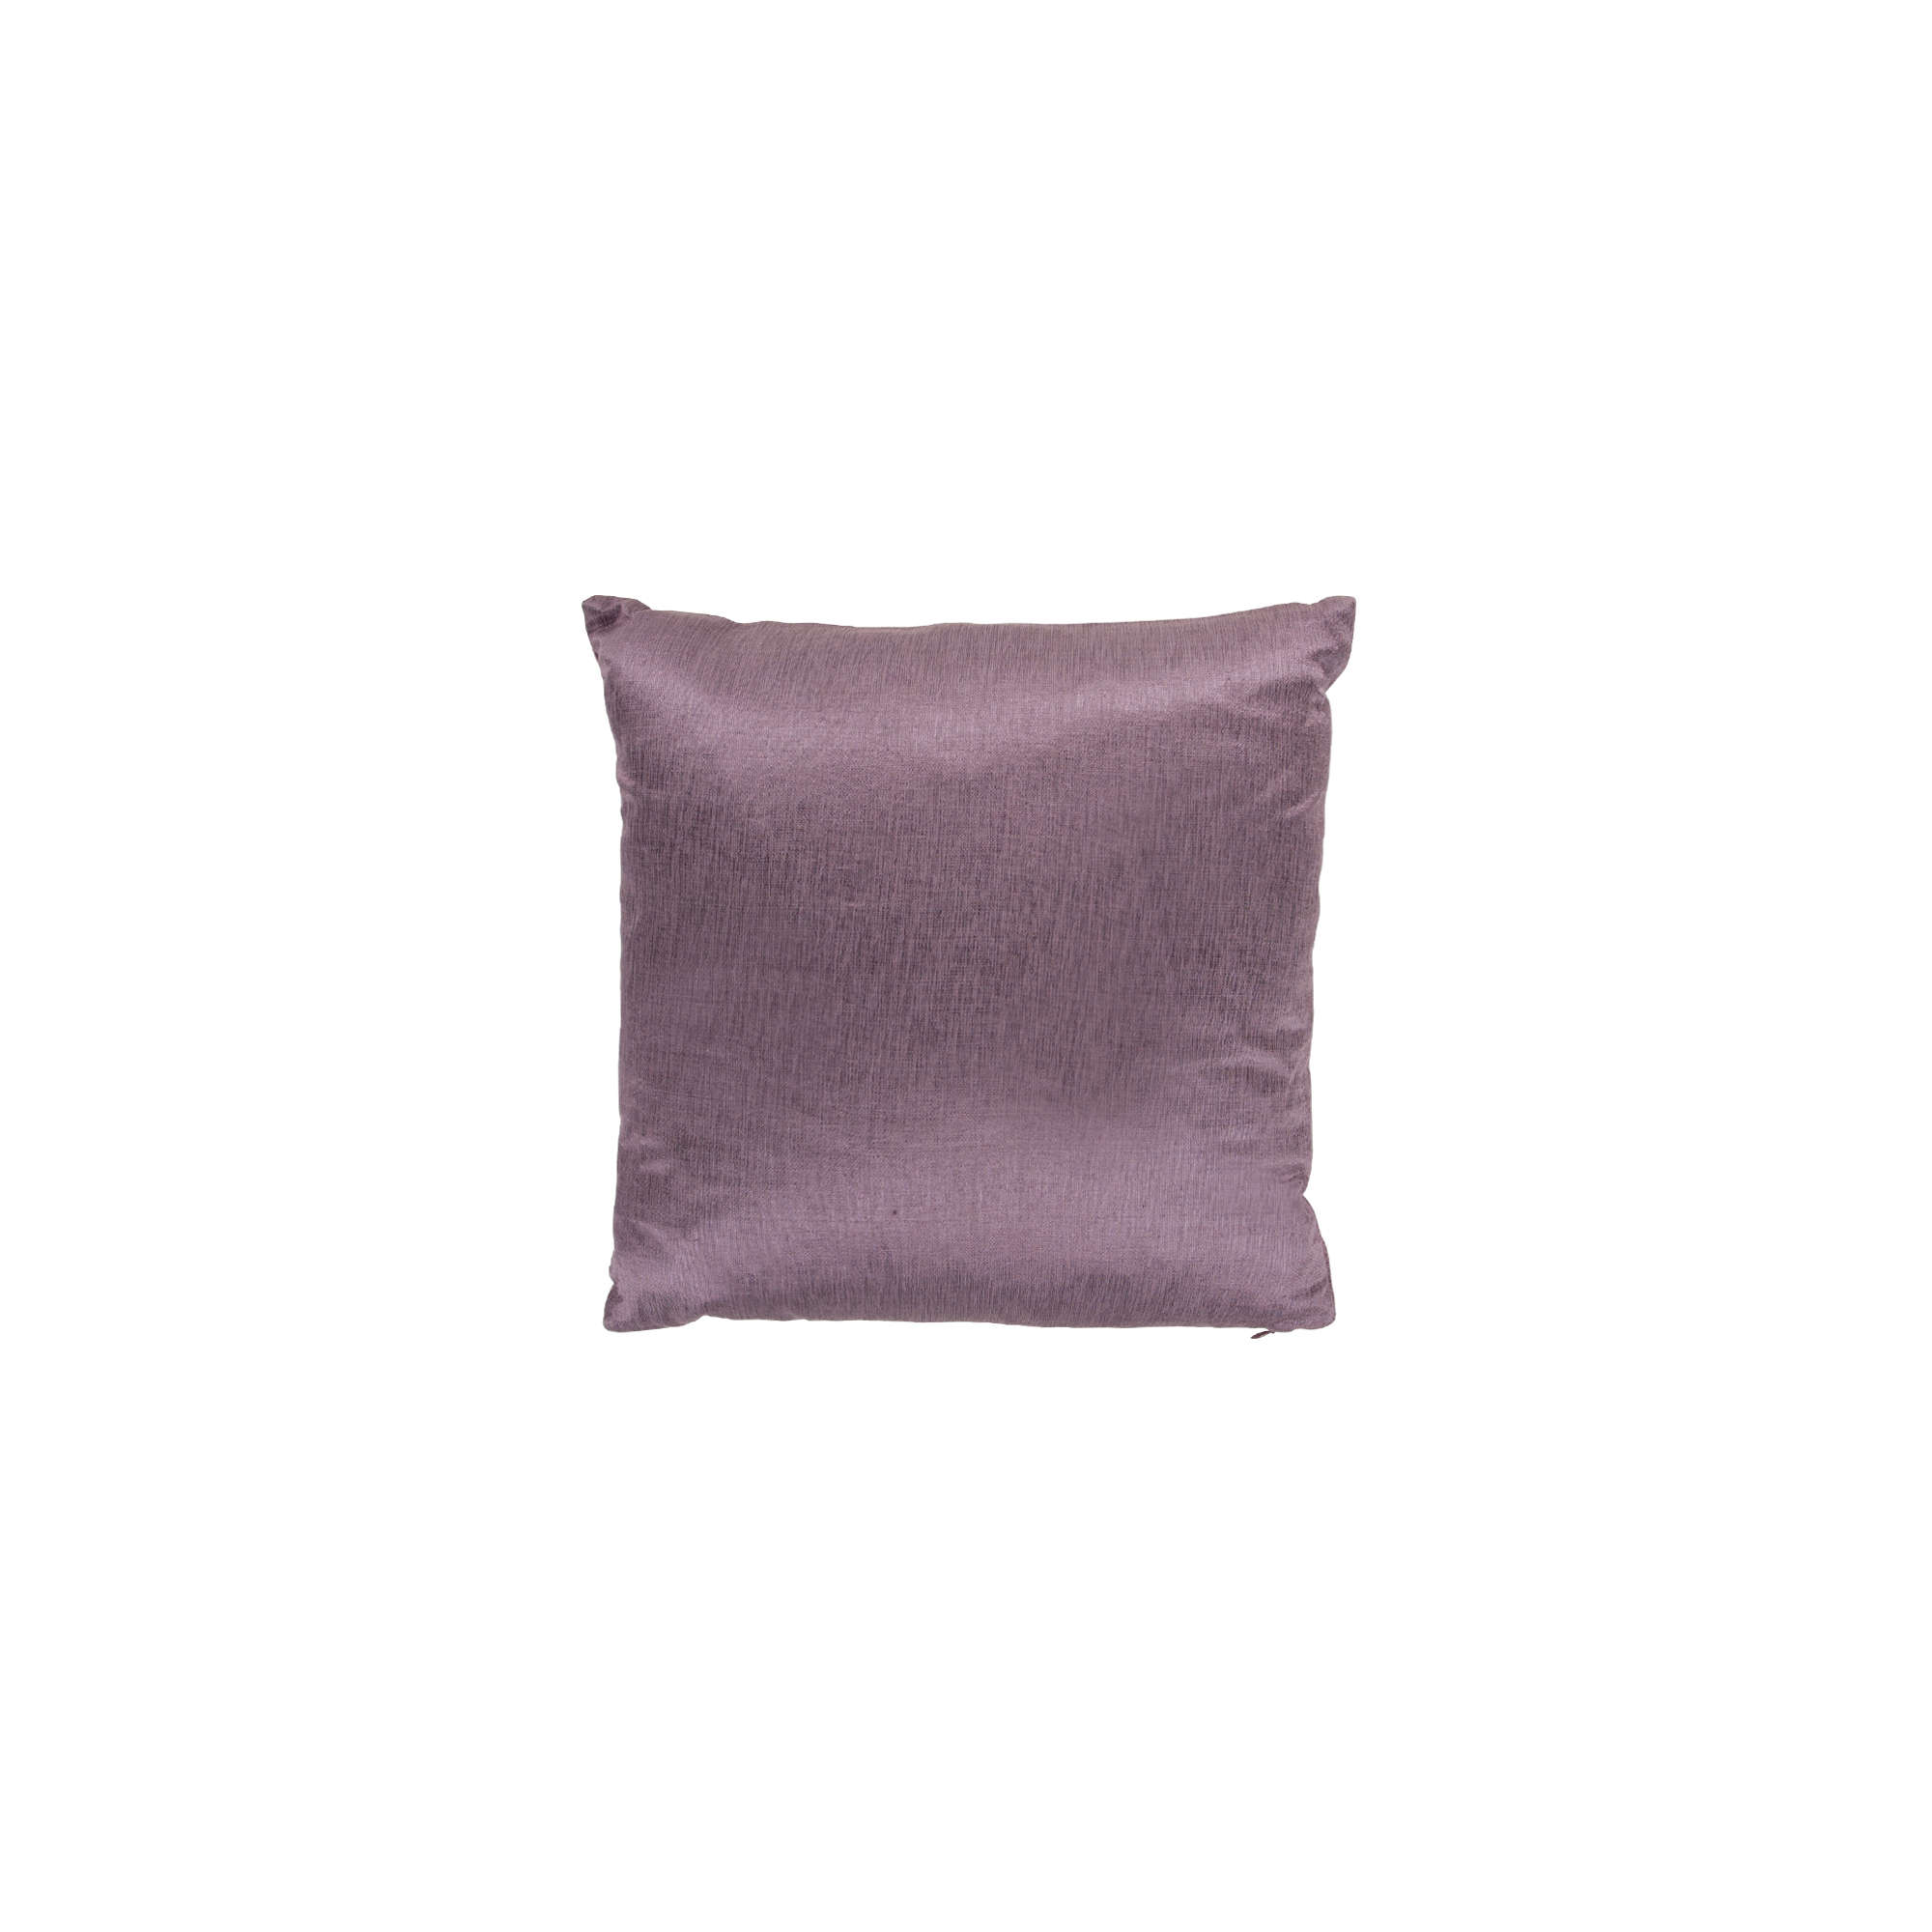 laura ashley kissen mit f llung flieder ebay. Black Bedroom Furniture Sets. Home Design Ideas